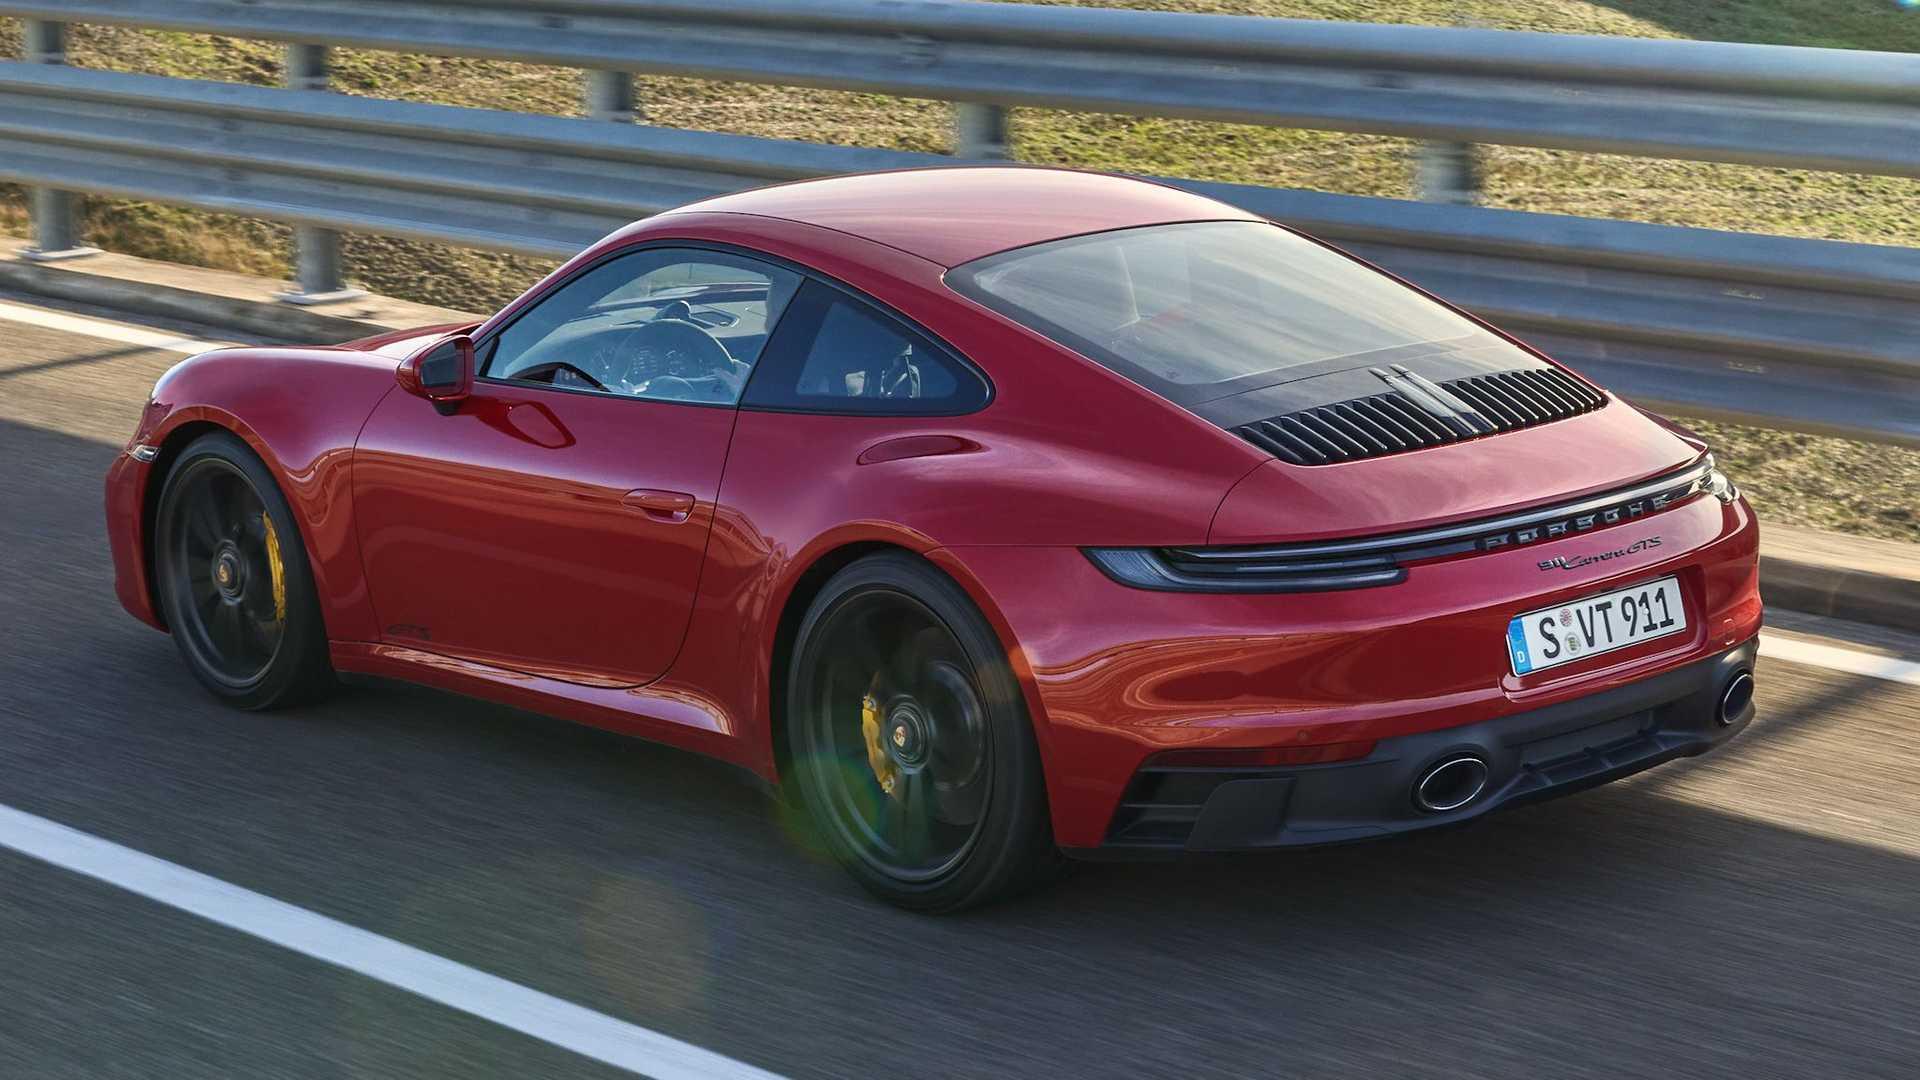 2022 Porsche 911 Carrera Gts Rear 3 4